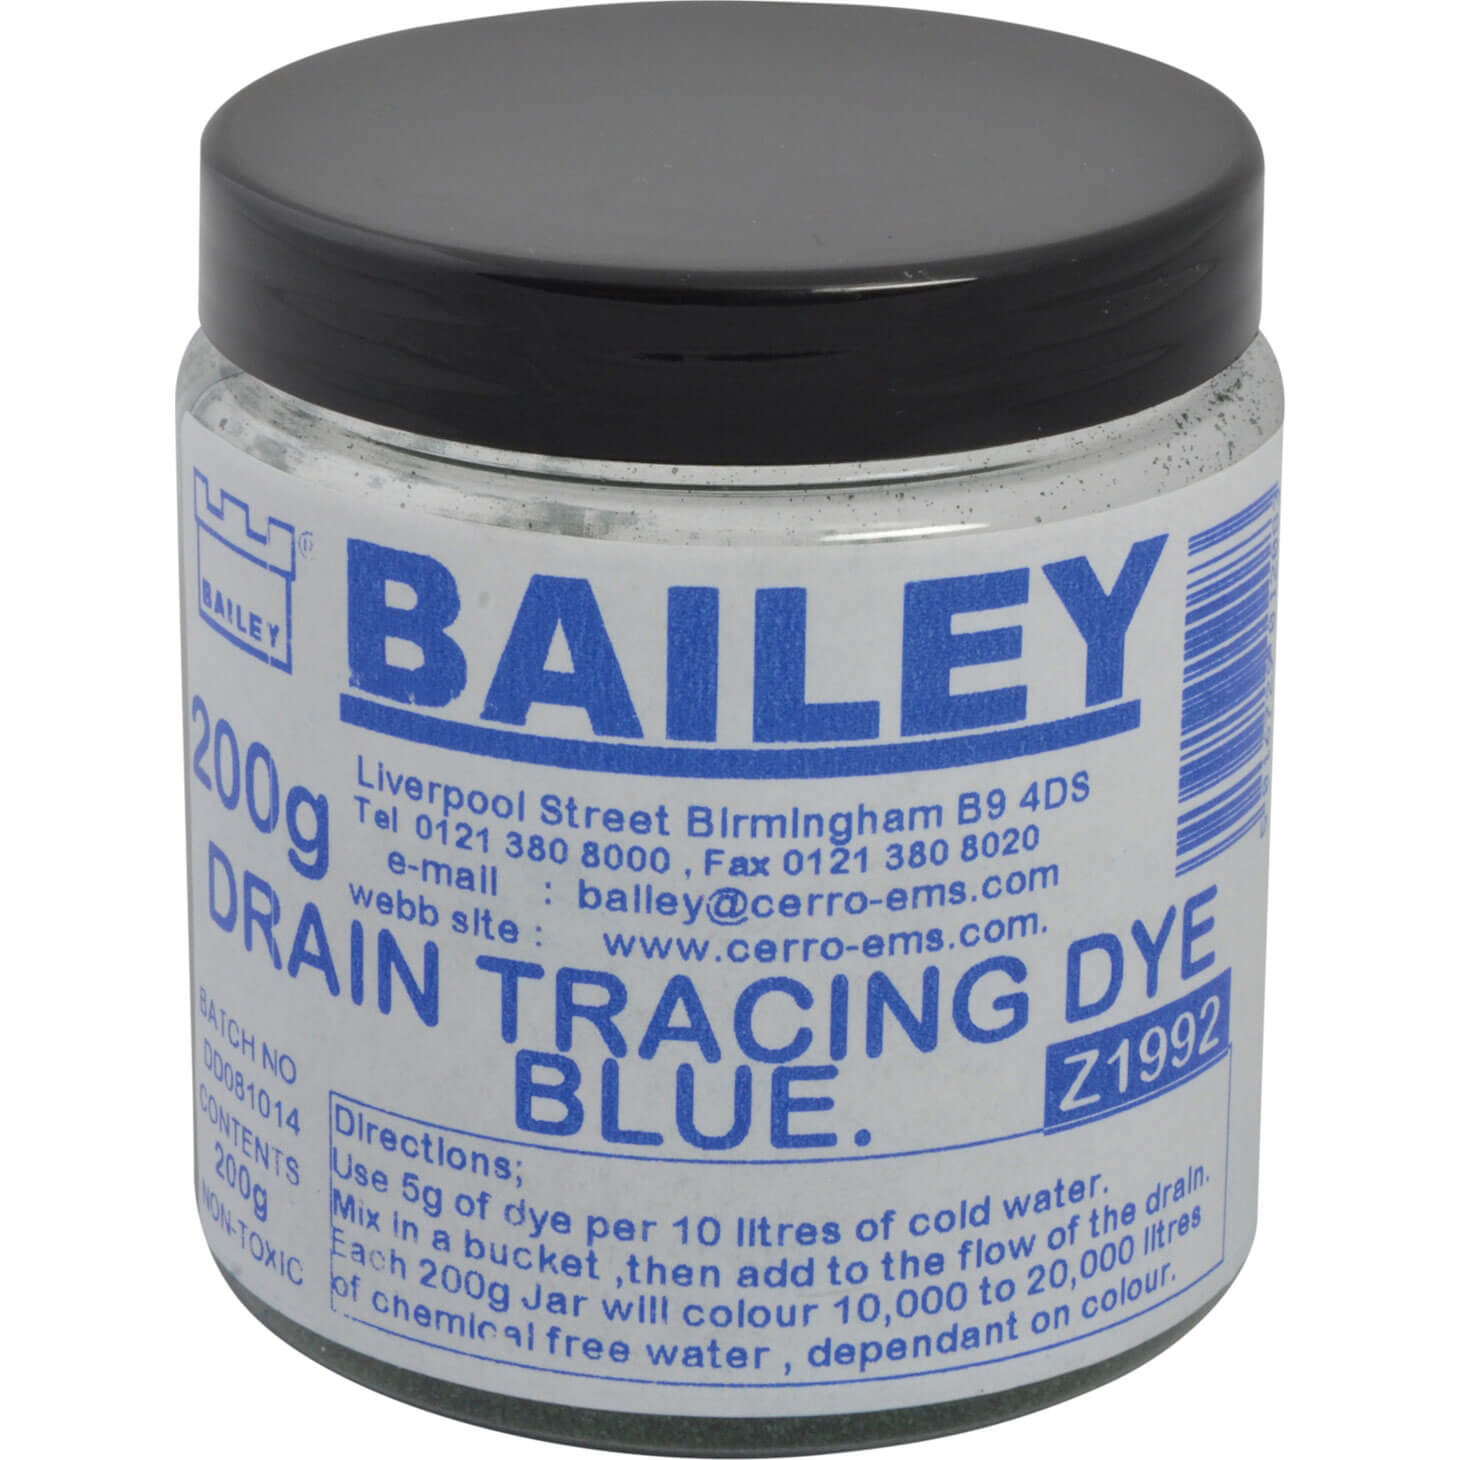 Bailey Drain Tracing Dye Blue 200g